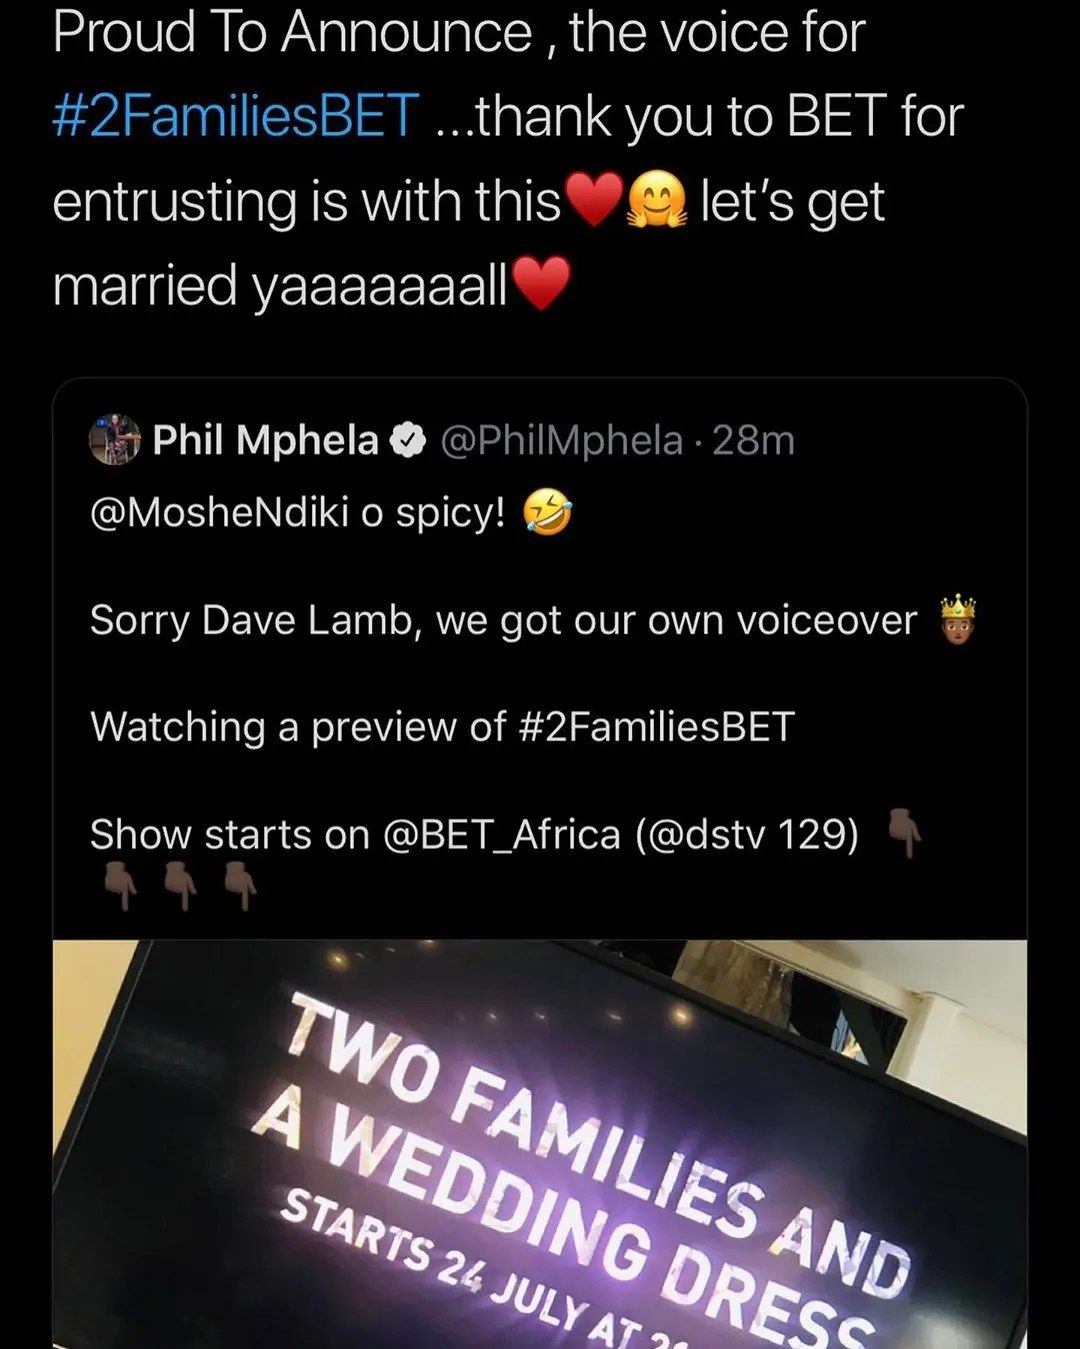 Moshe Ndiki will co-host new BET wedding reality show